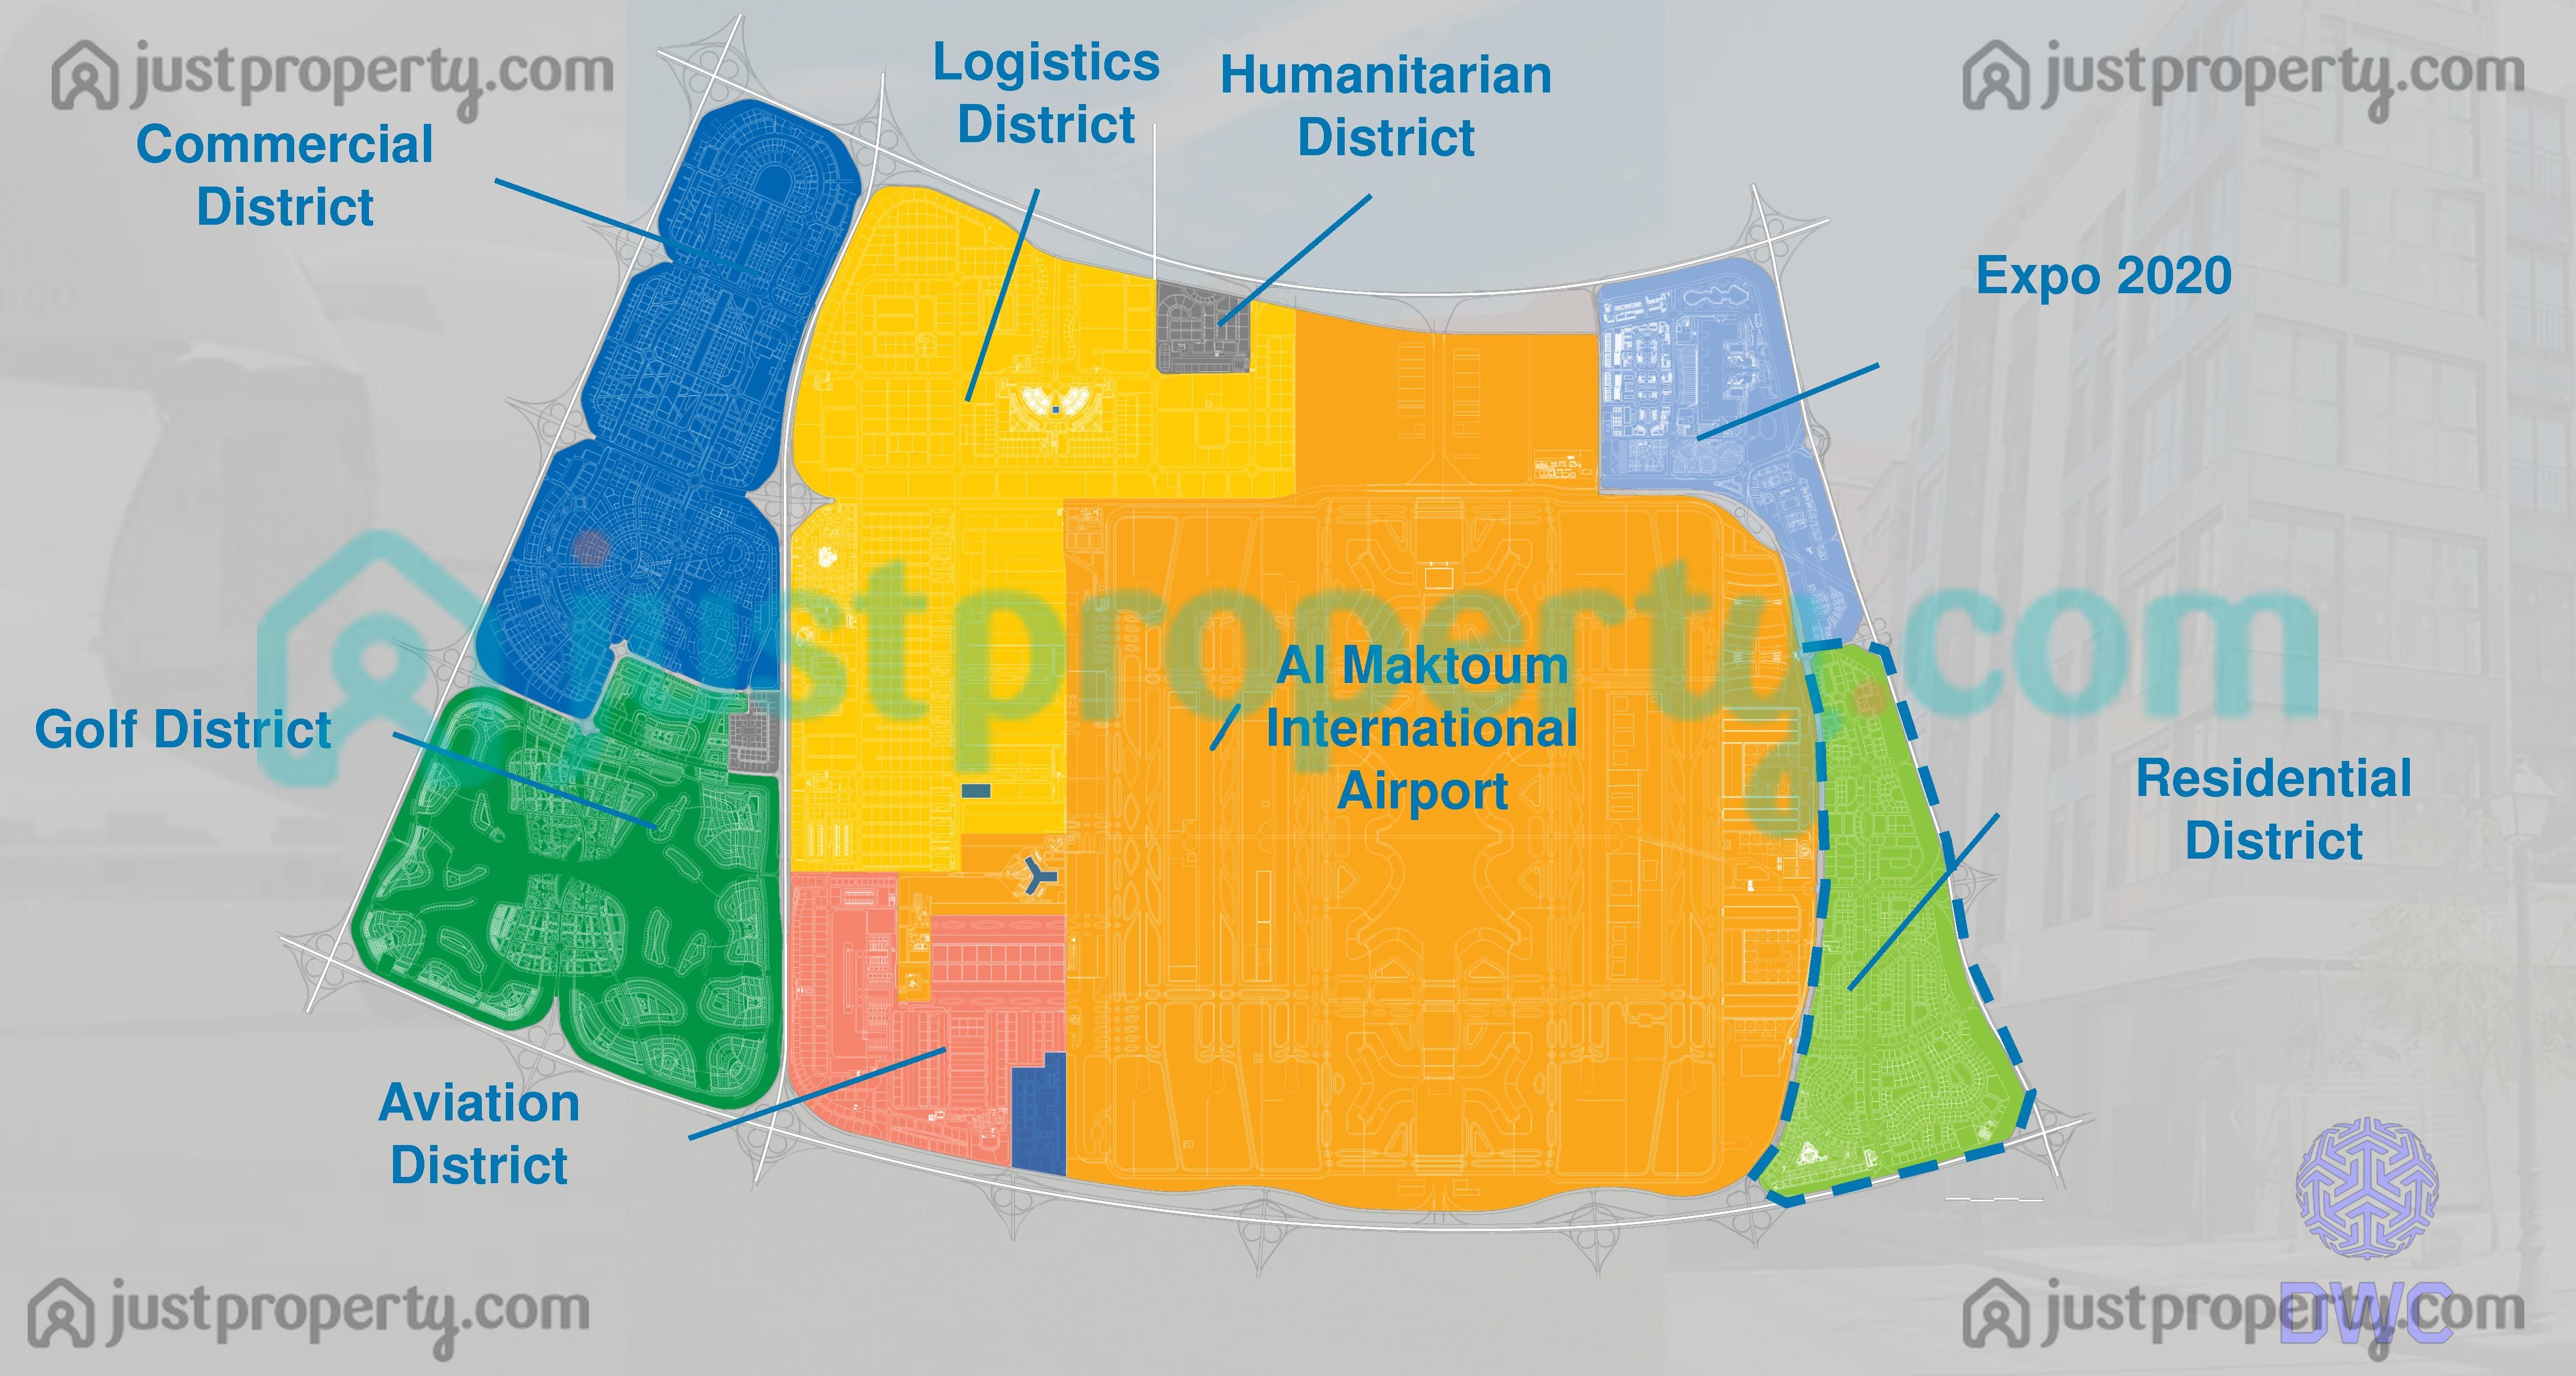 Floor Plans for Dubai World Central (DWC)